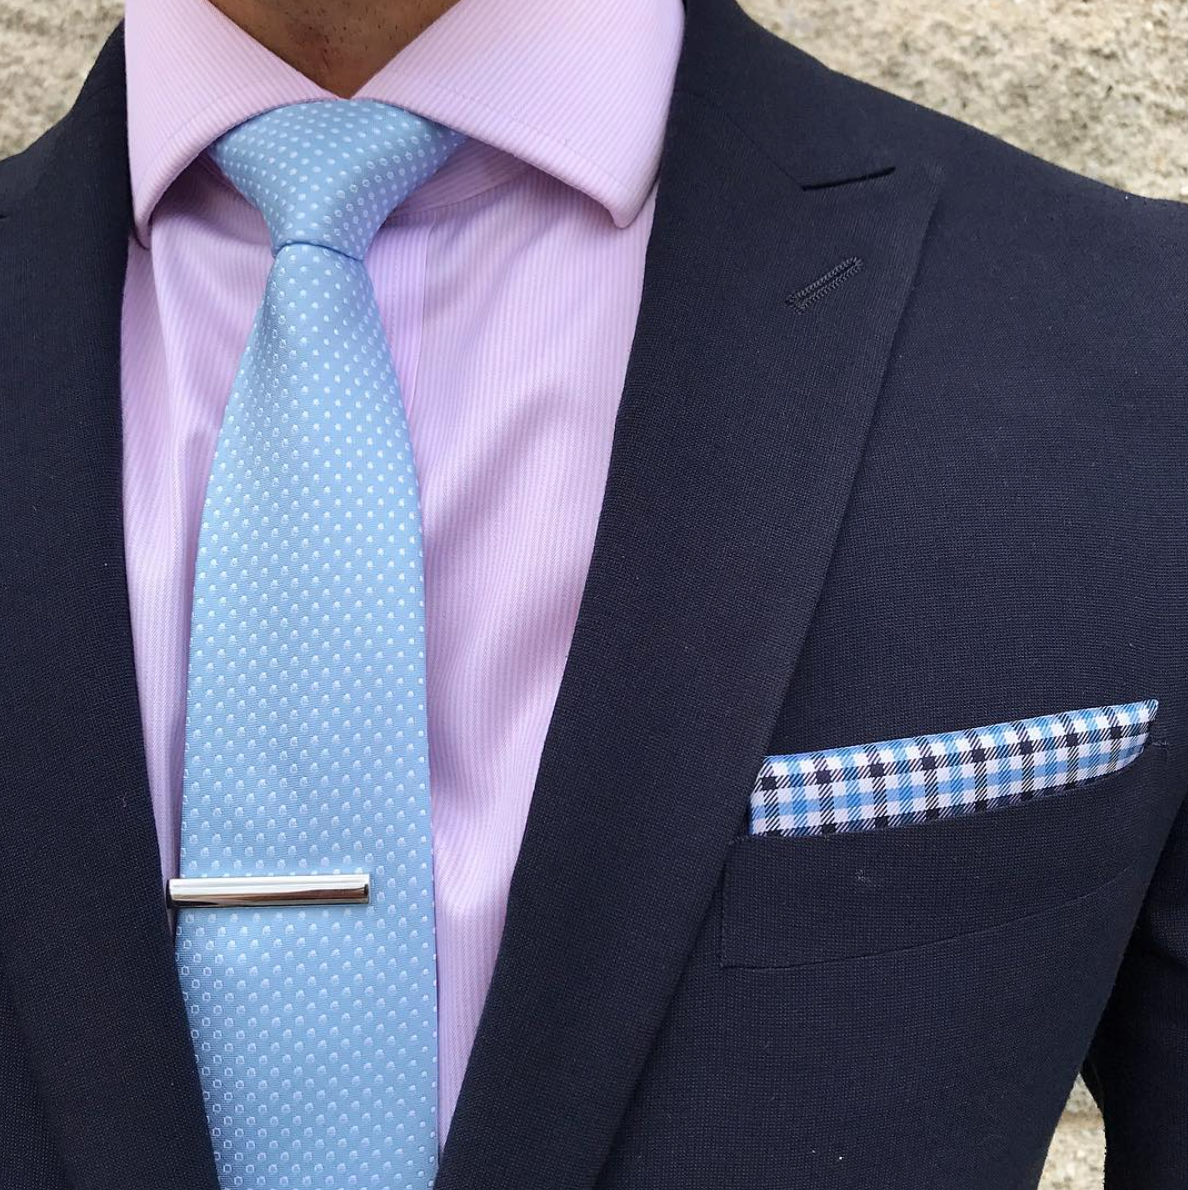 Pure Light Navy Mens Fashion Silvery Dots Pre-tied Bowtie Pocket Square Set